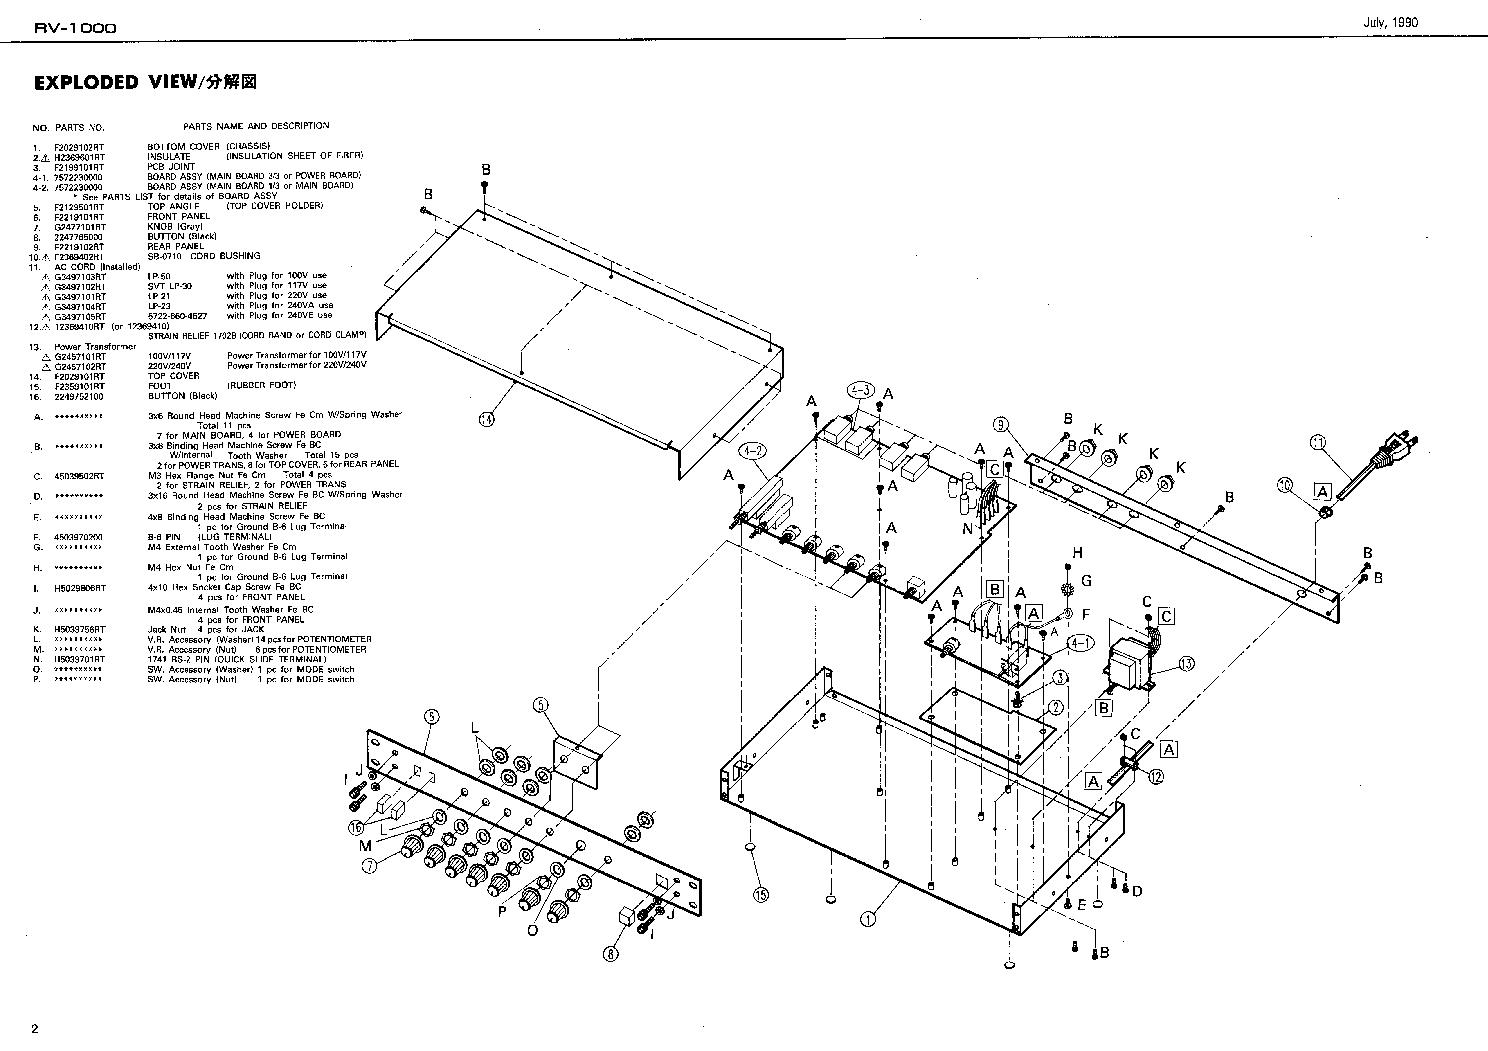 BOSS RV-1000 SM Service Manual download, schematics